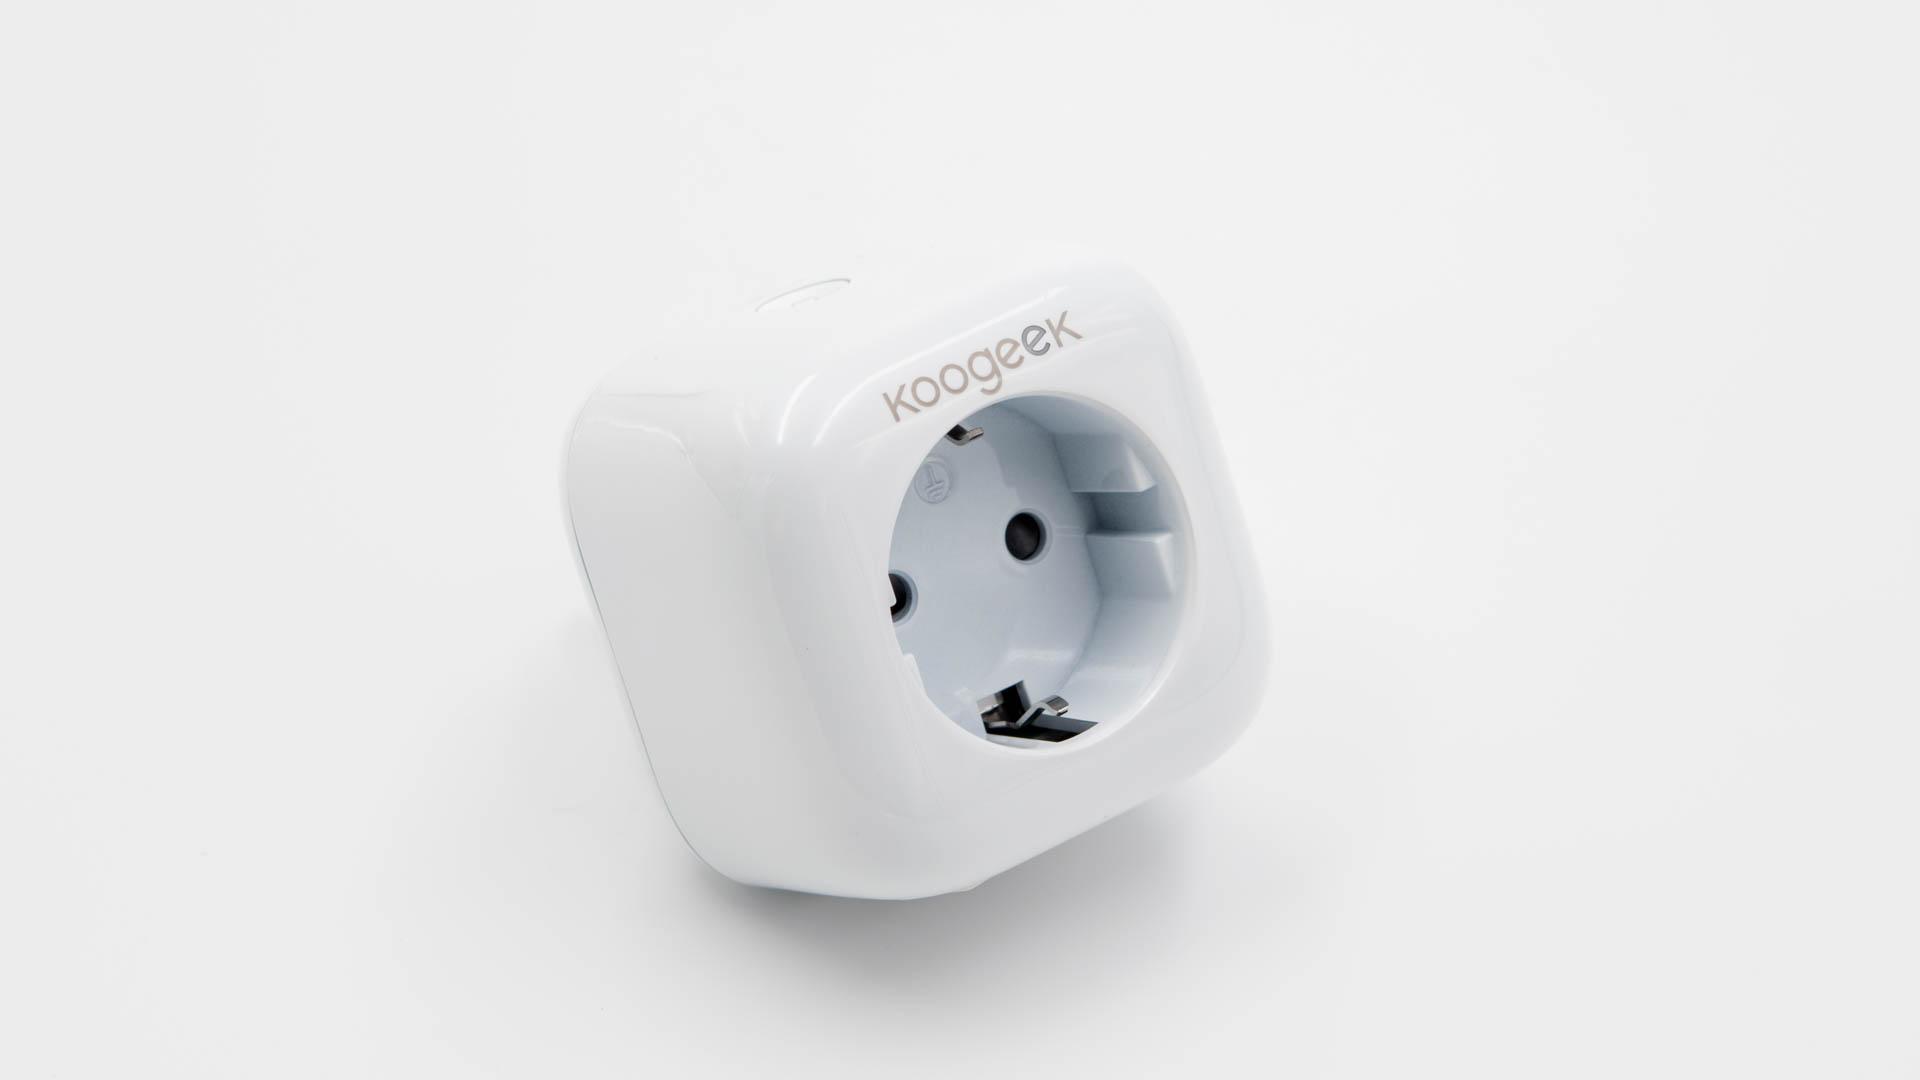 koogeek p1eu plug wlan steckdose mit apple homekit support techtest. Black Bedroom Furniture Sets. Home Design Ideas